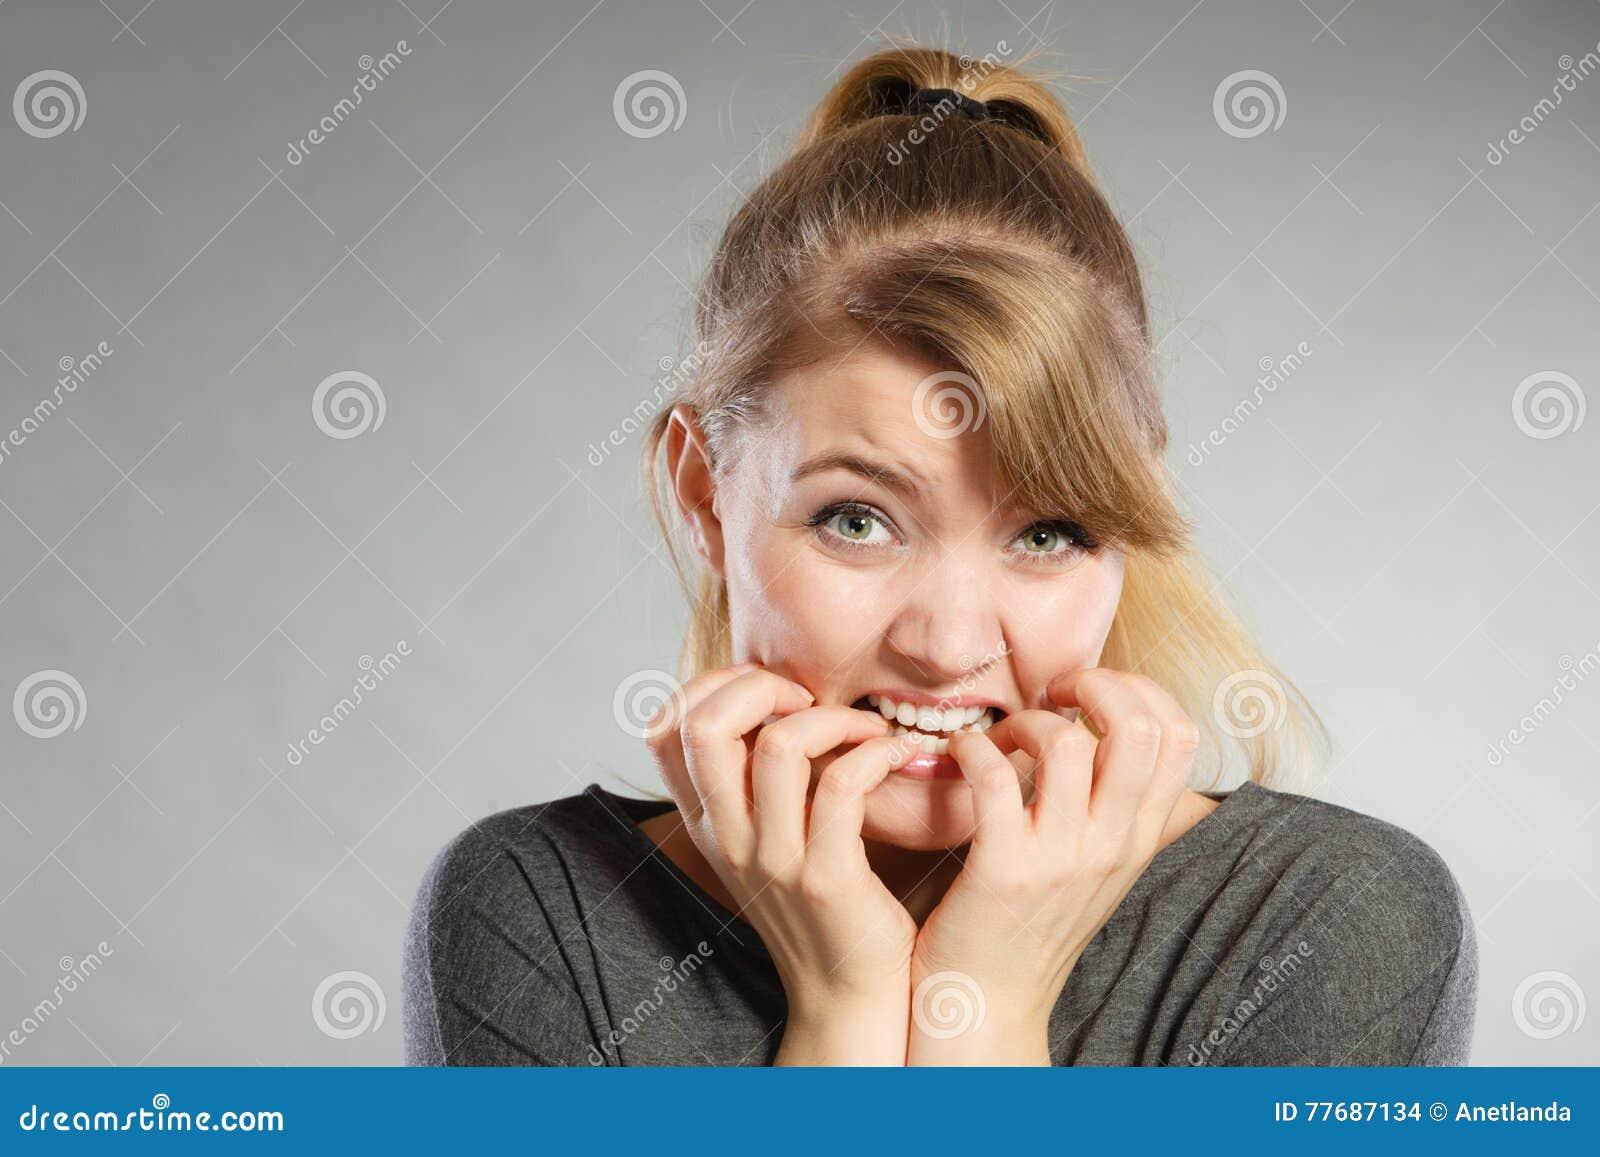 Nervous girl biting nails.